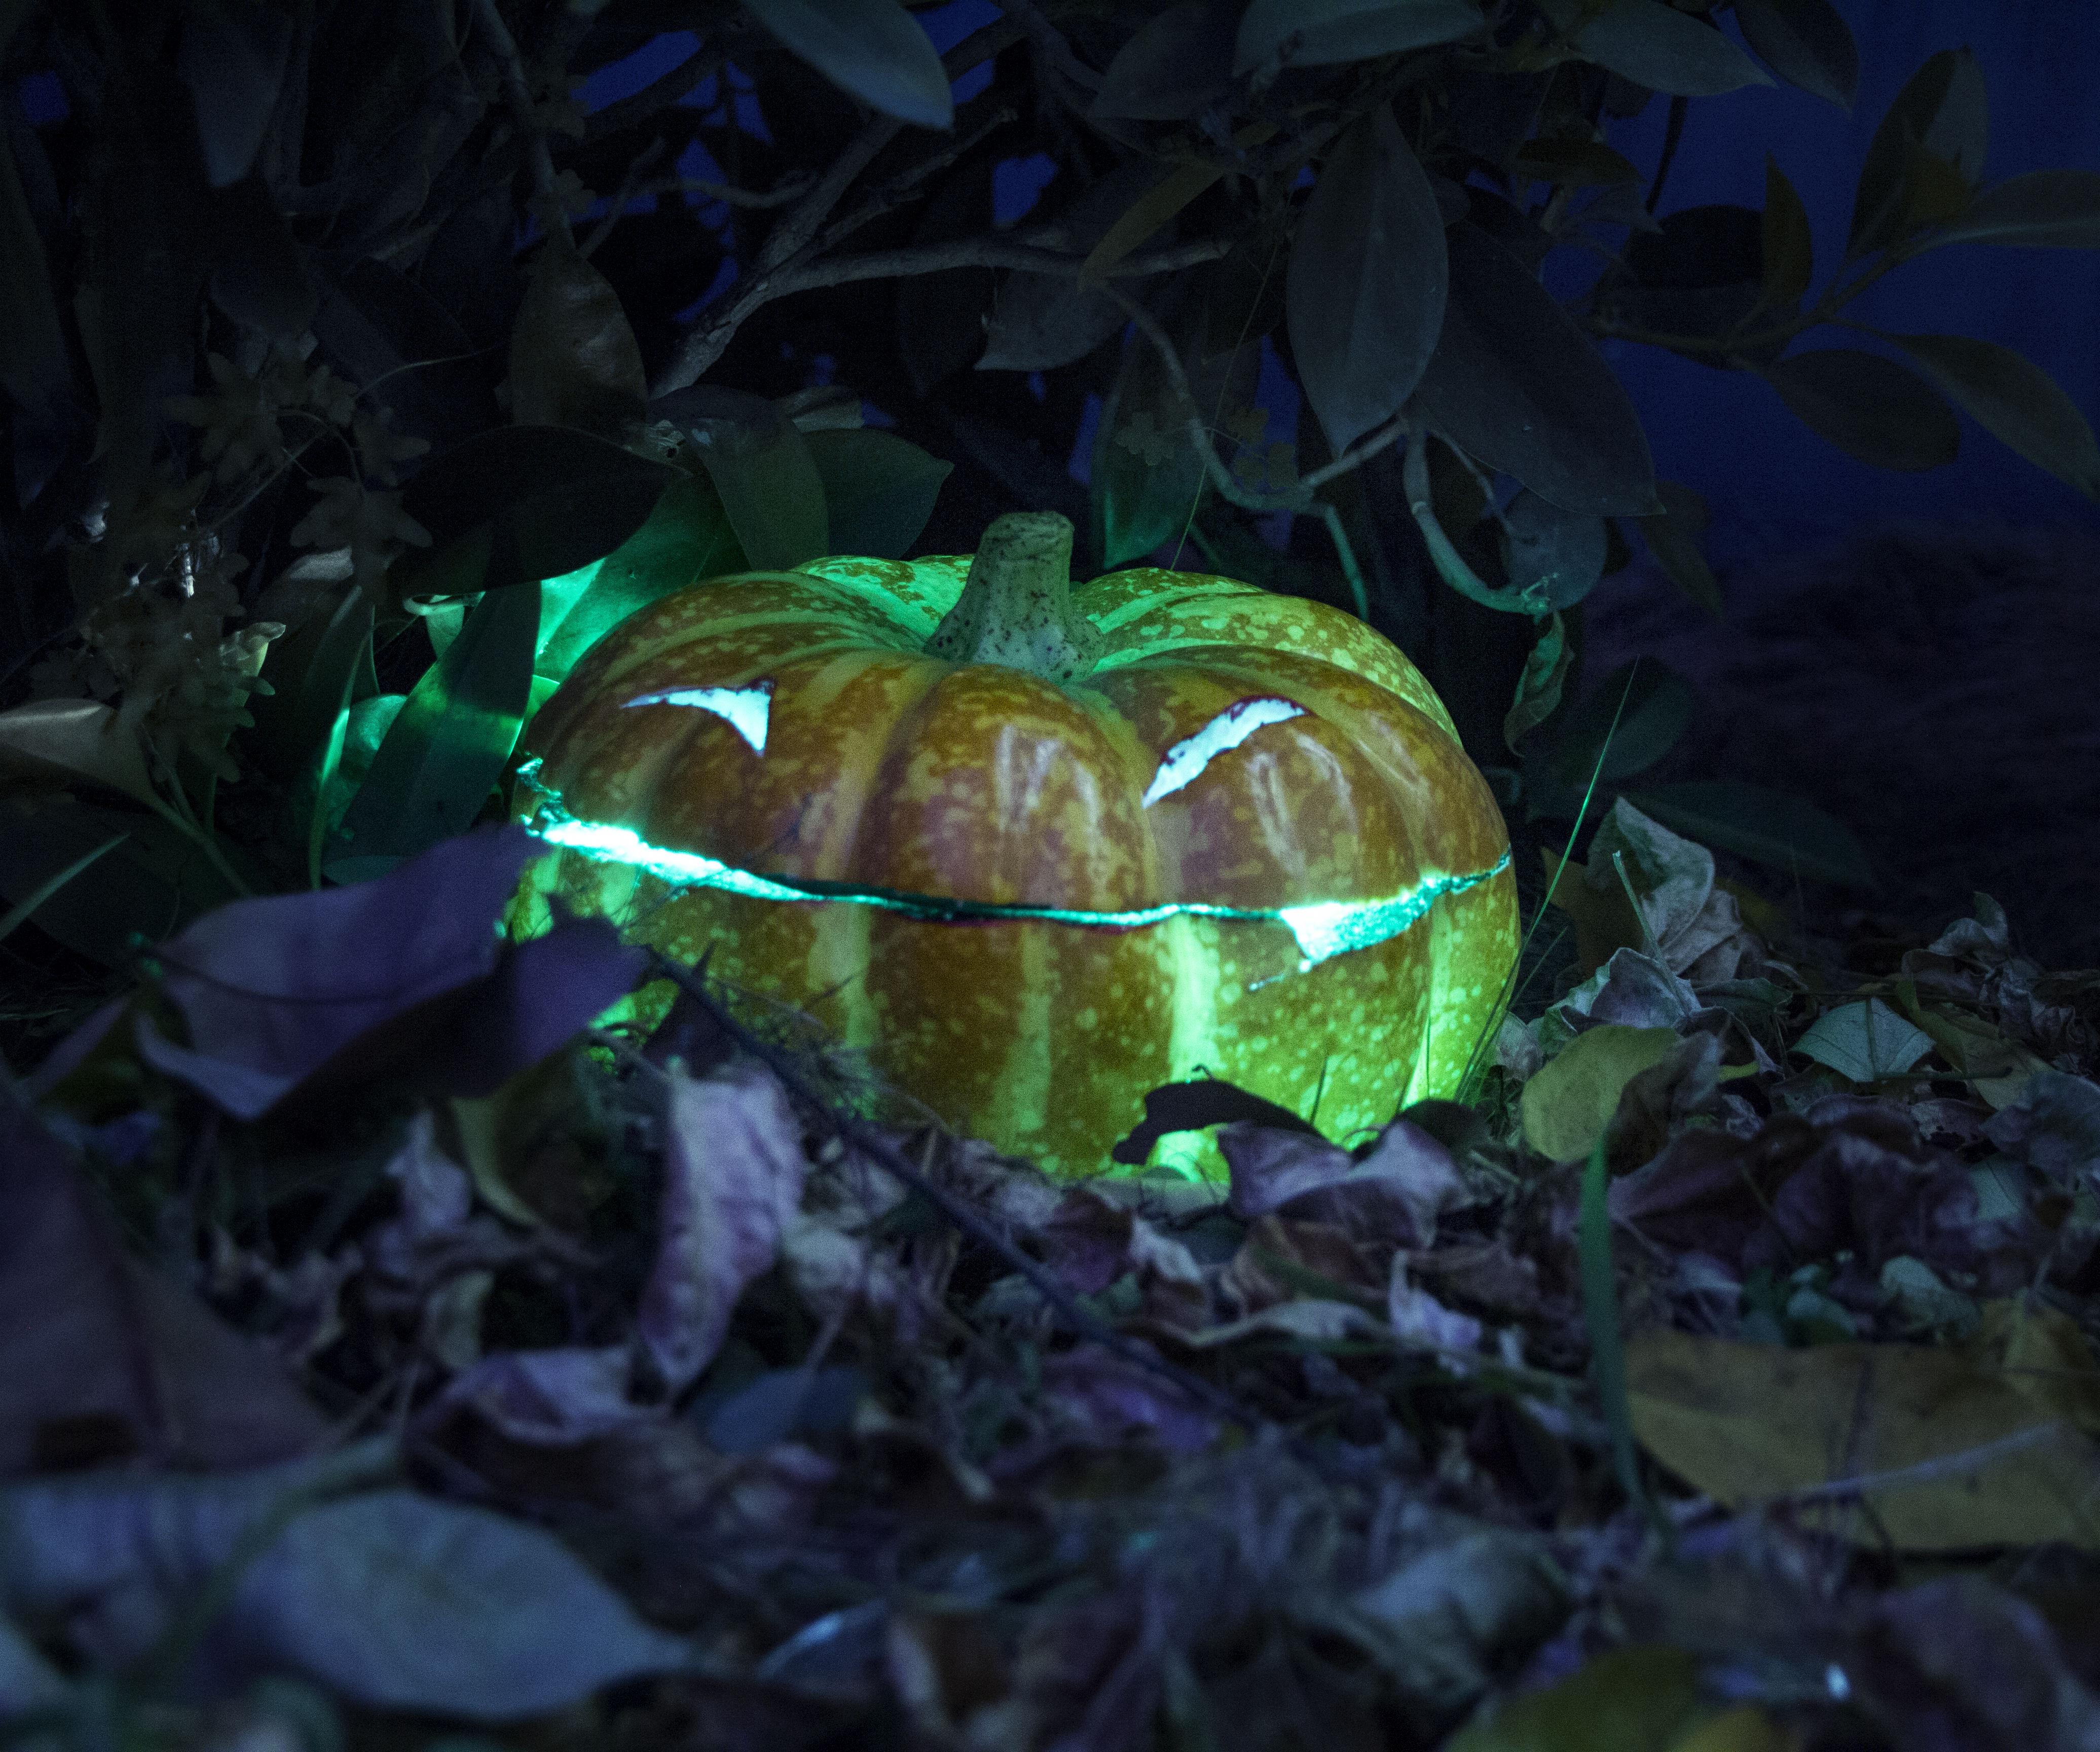 How to Make a Screaming Halloween Pumpkin (Jack-o'-lantern)